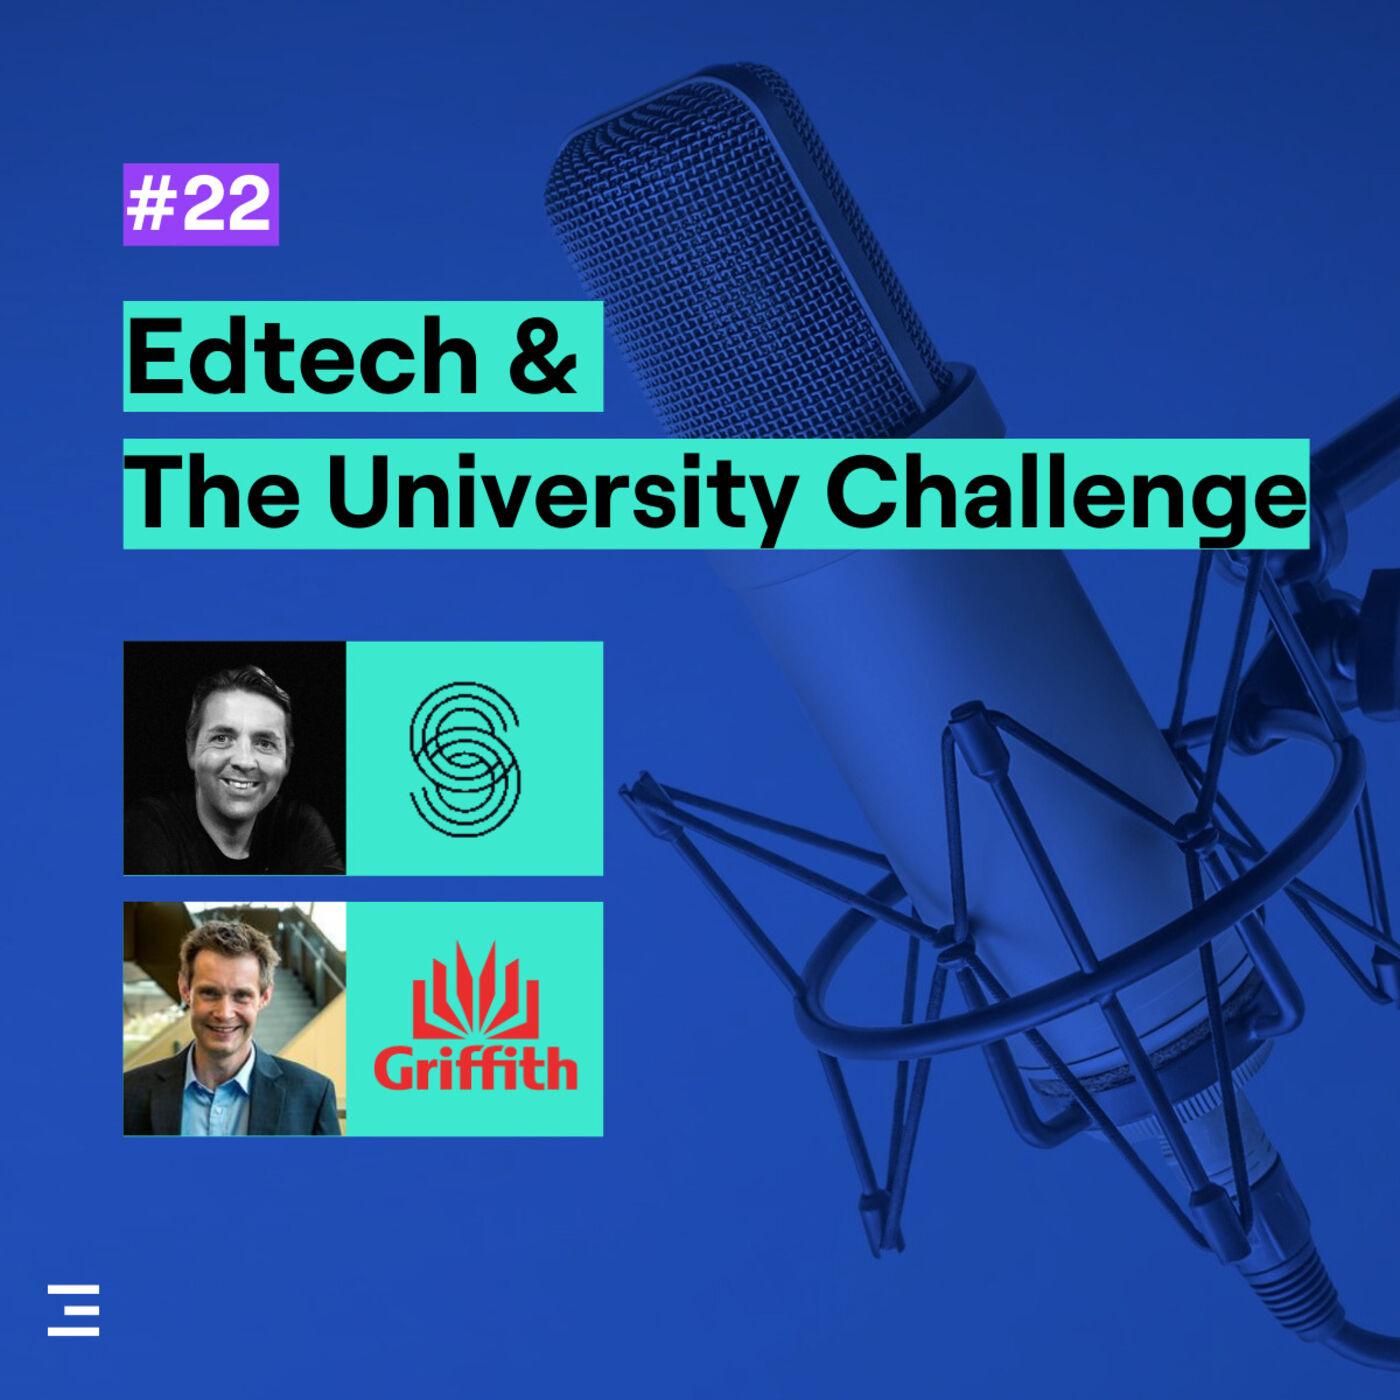 22. Edtech & the University Challenge